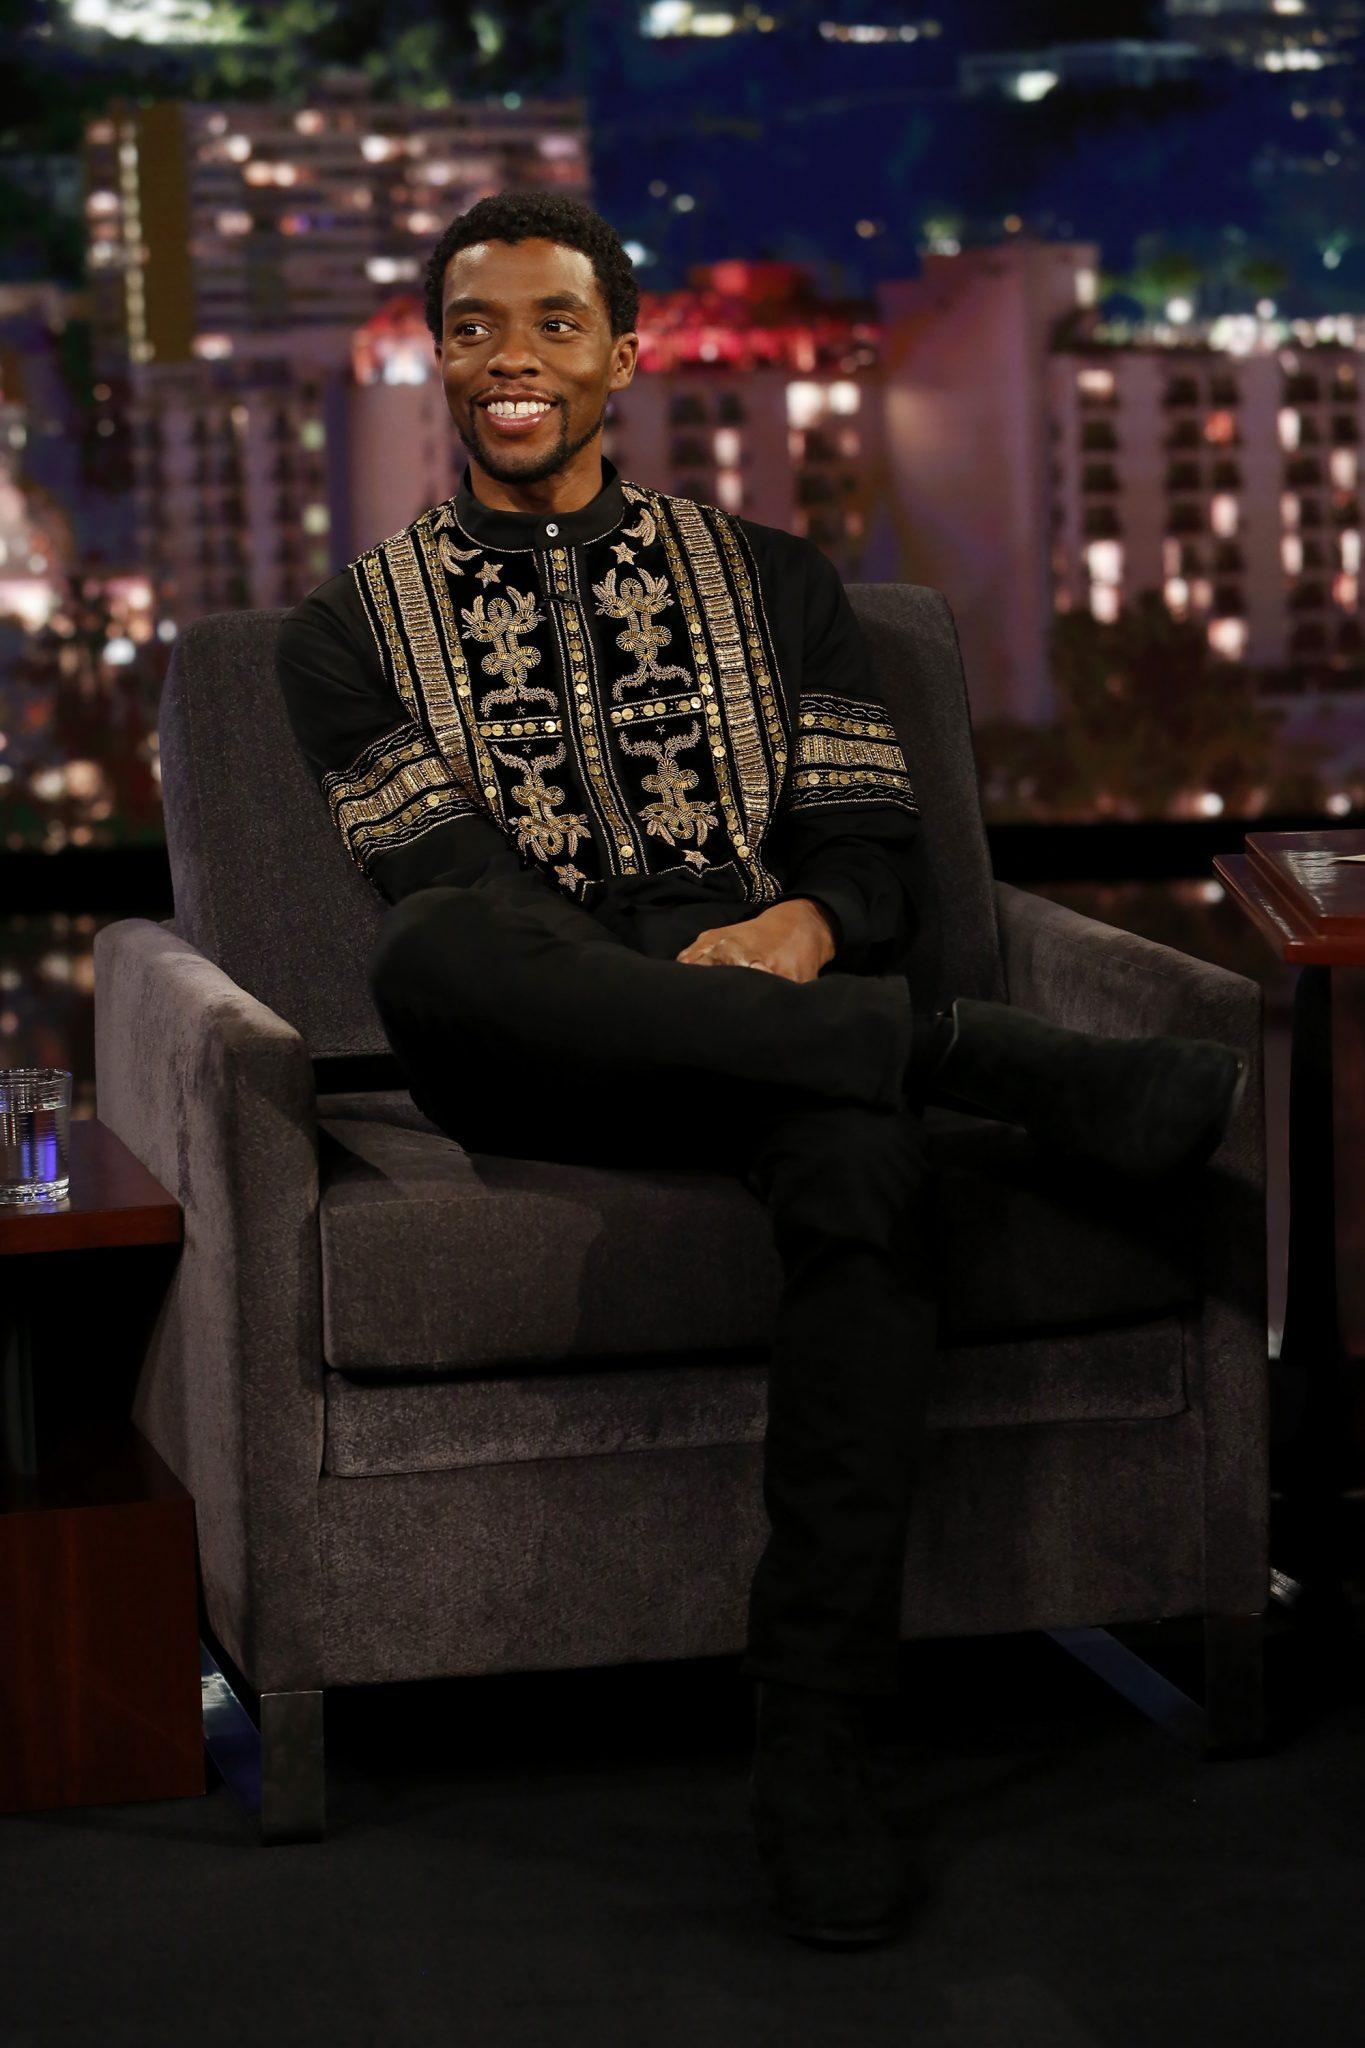 In Case You Missed It: Chadwick Boseman On Jimmy Kimmel Live